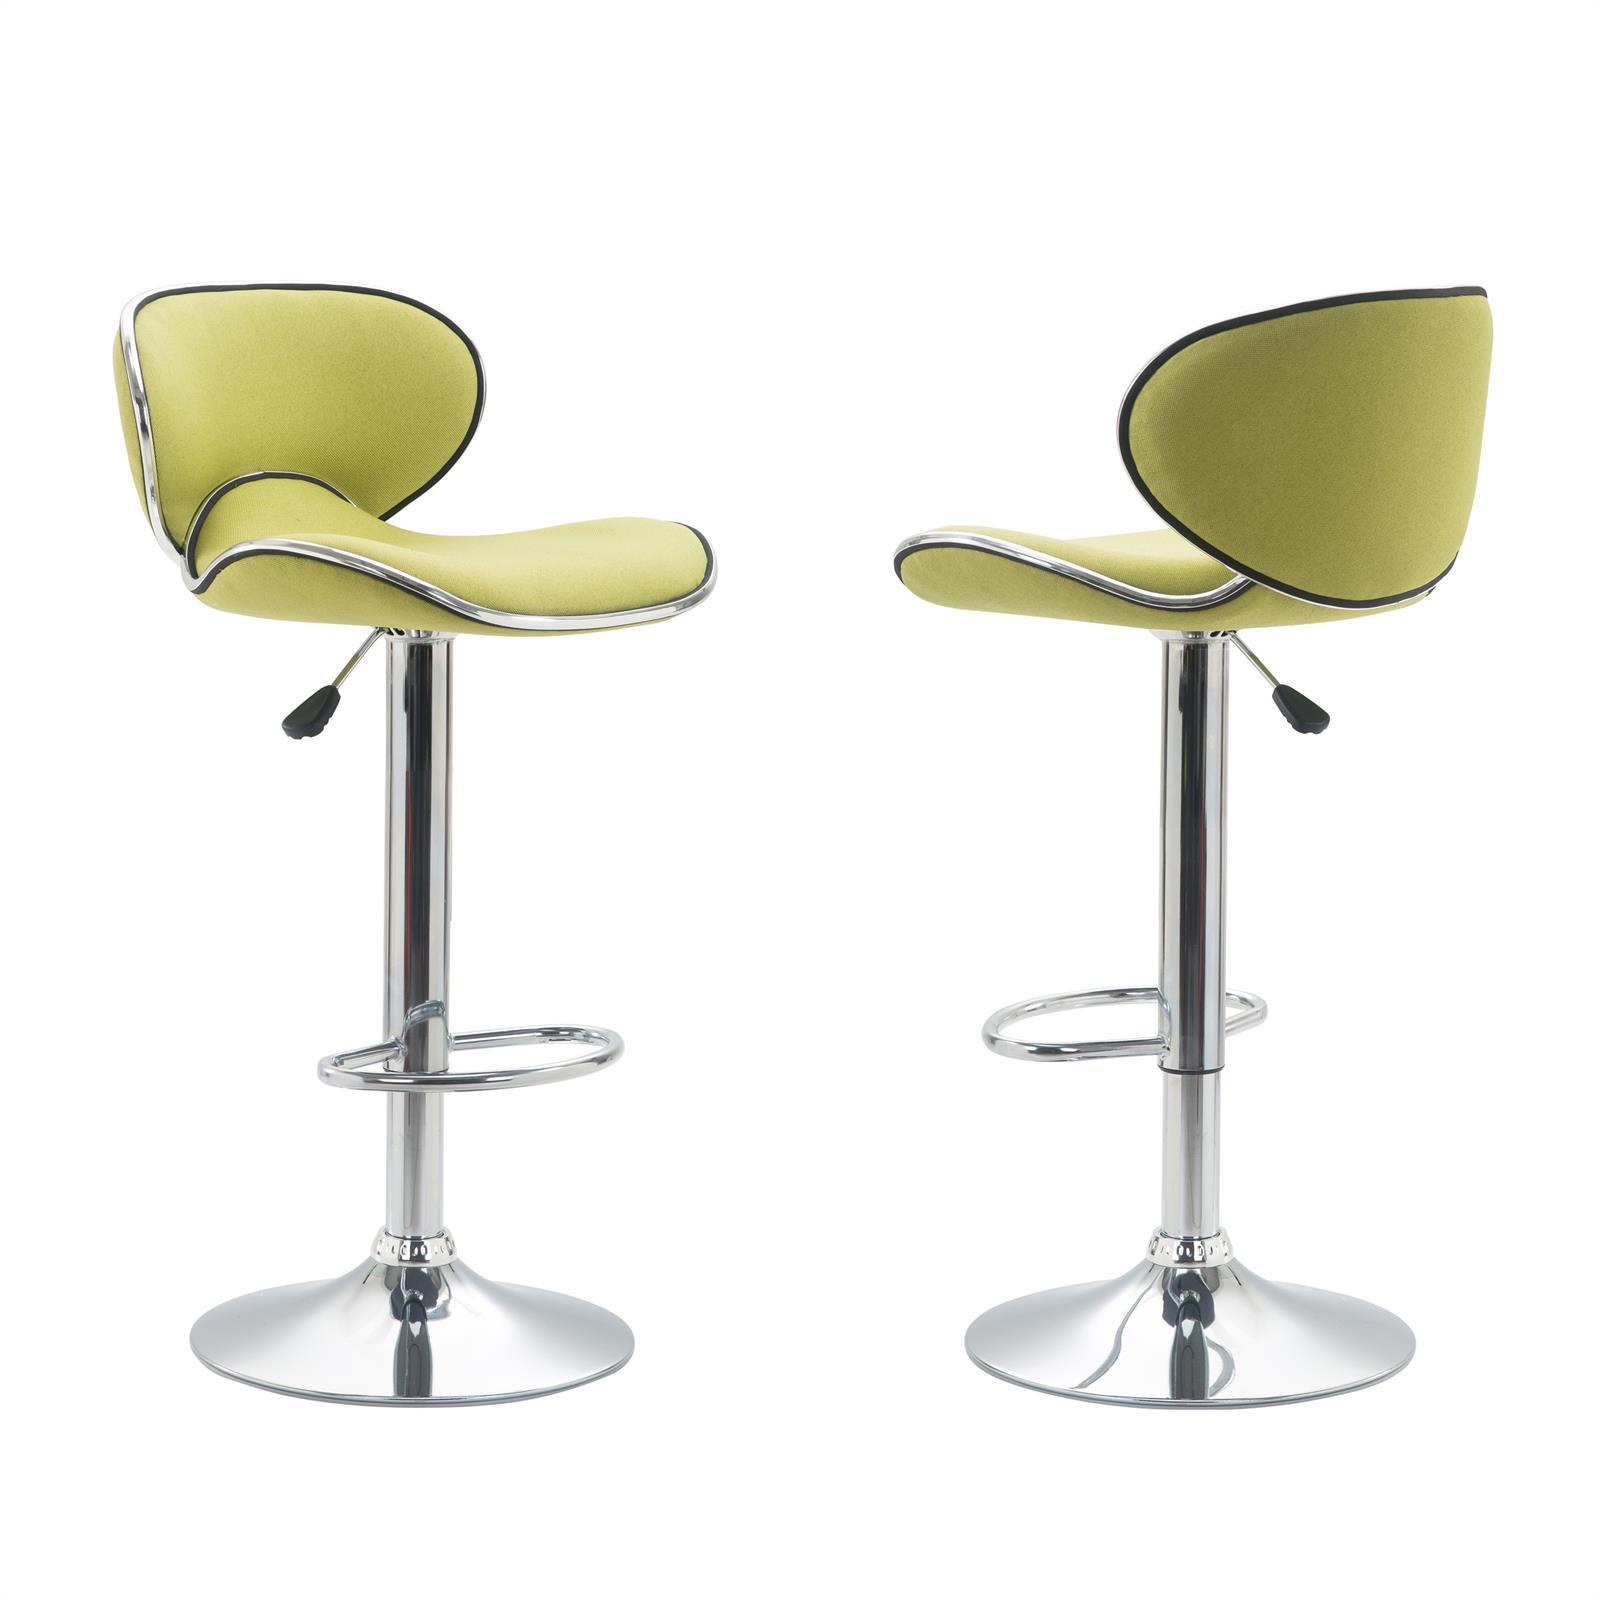 Barhocker lounge mit stoffbezug gr n im 2er pack mobilia24 for Barhocker stoffbezug